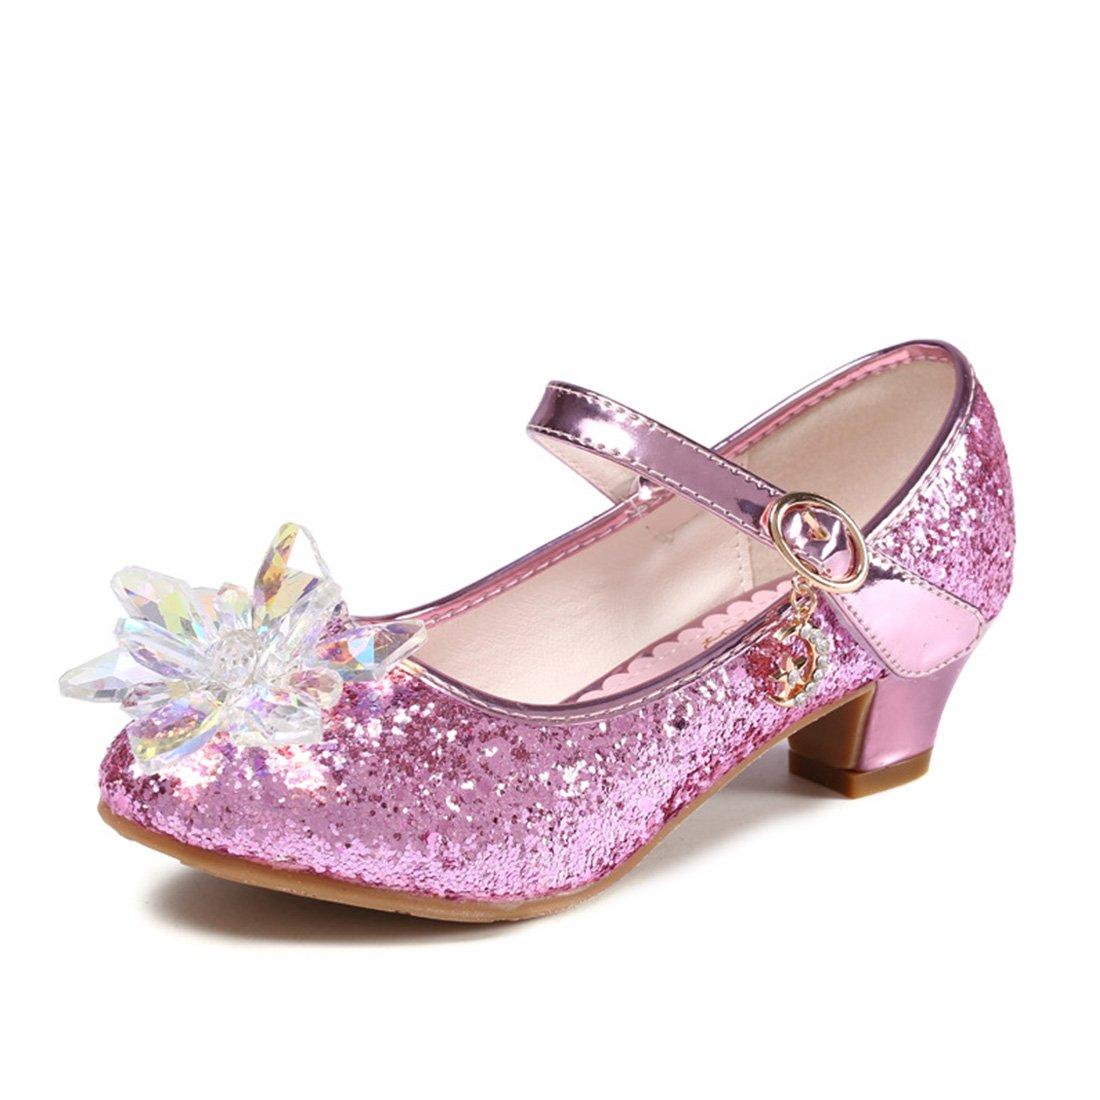 YIBLBOX Little Girls Sparking Cute Low Heel Princess Dress Dance Shoes Wedding Party Shoe Mary Jane